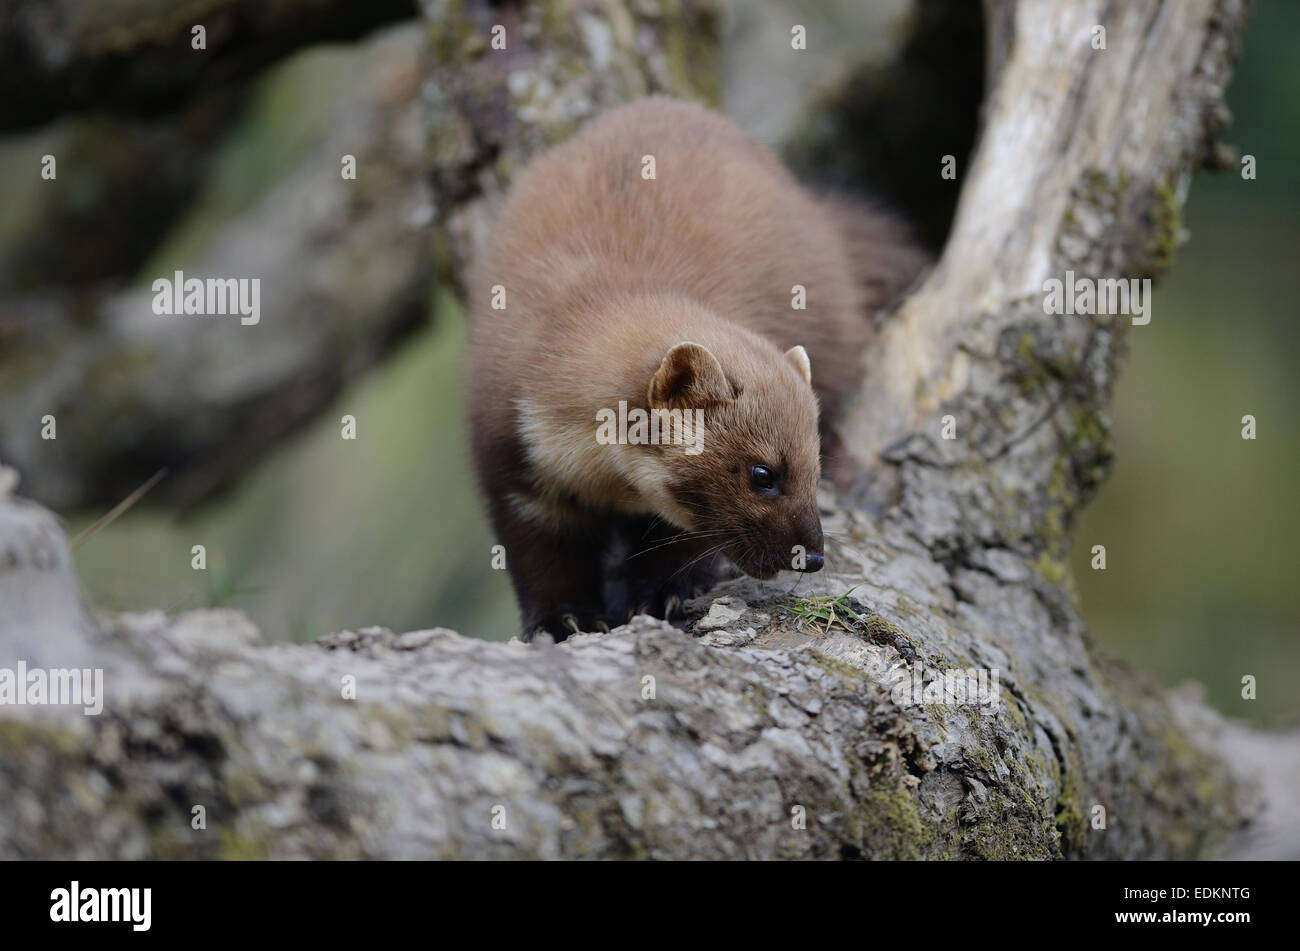 pine marten martes martes mustelid Carnivora Mustelidae hunter - Stock Image